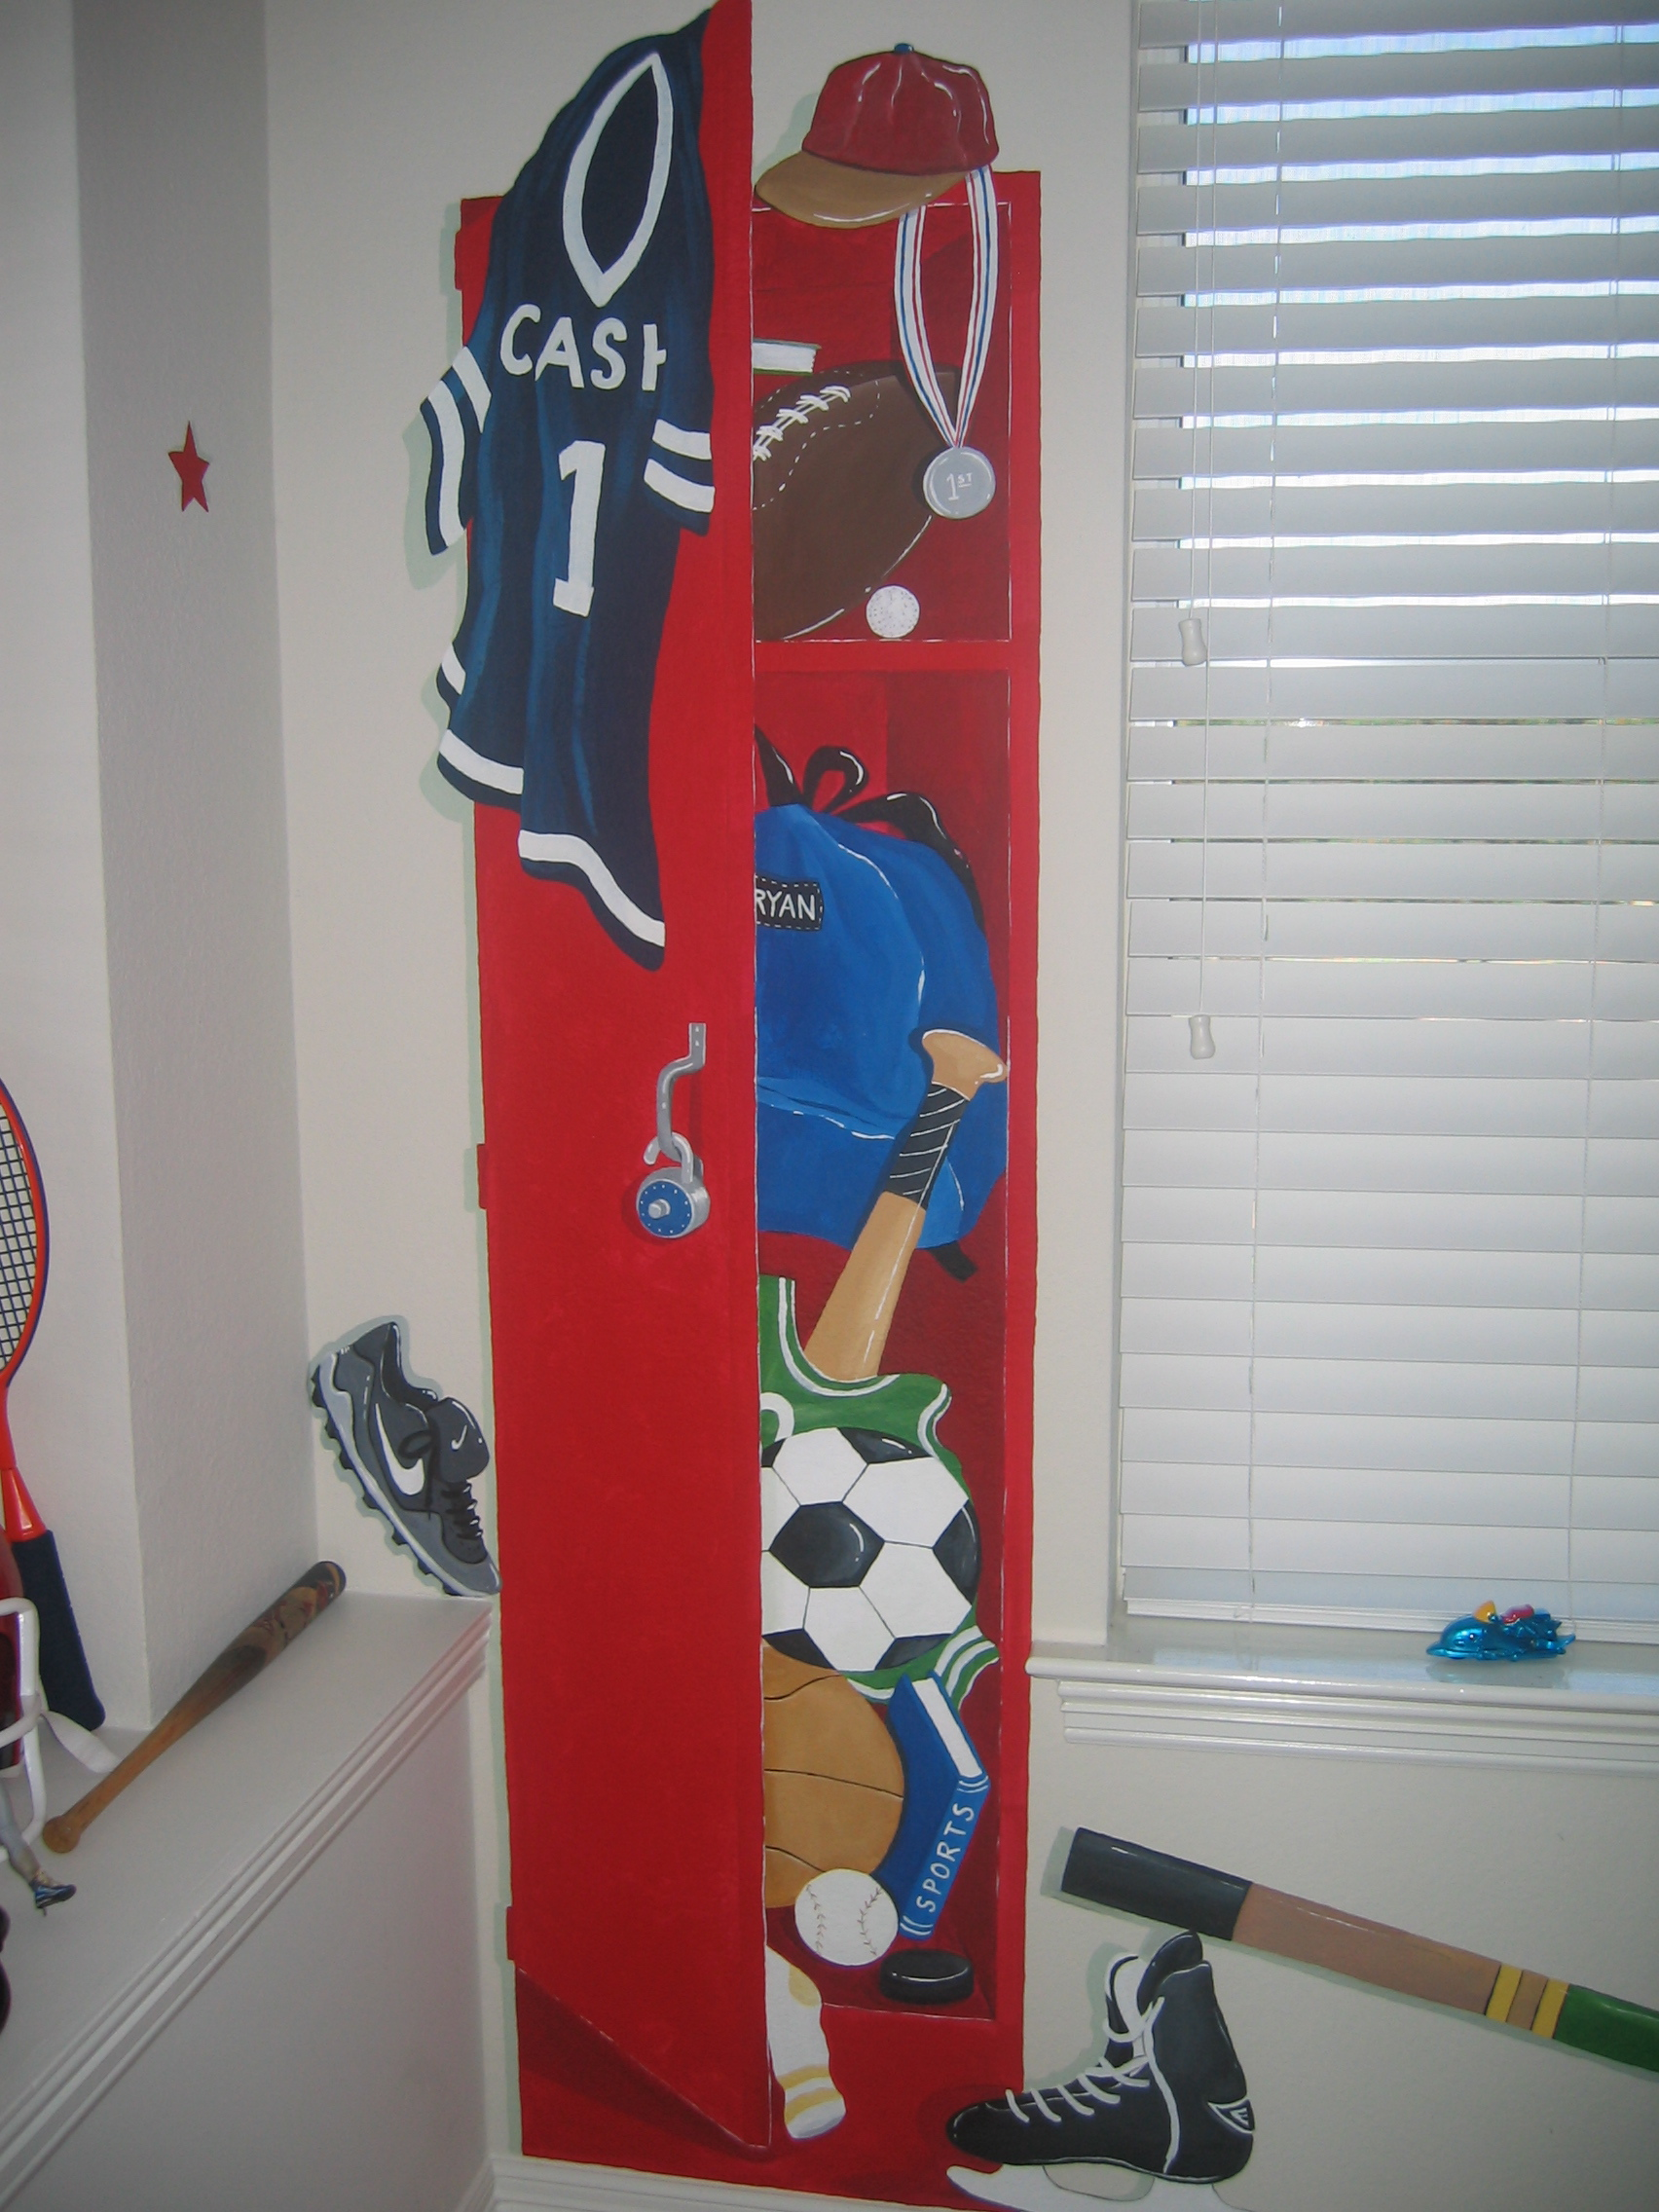 20030723.09.frisco.mural.sports.locker.jpg